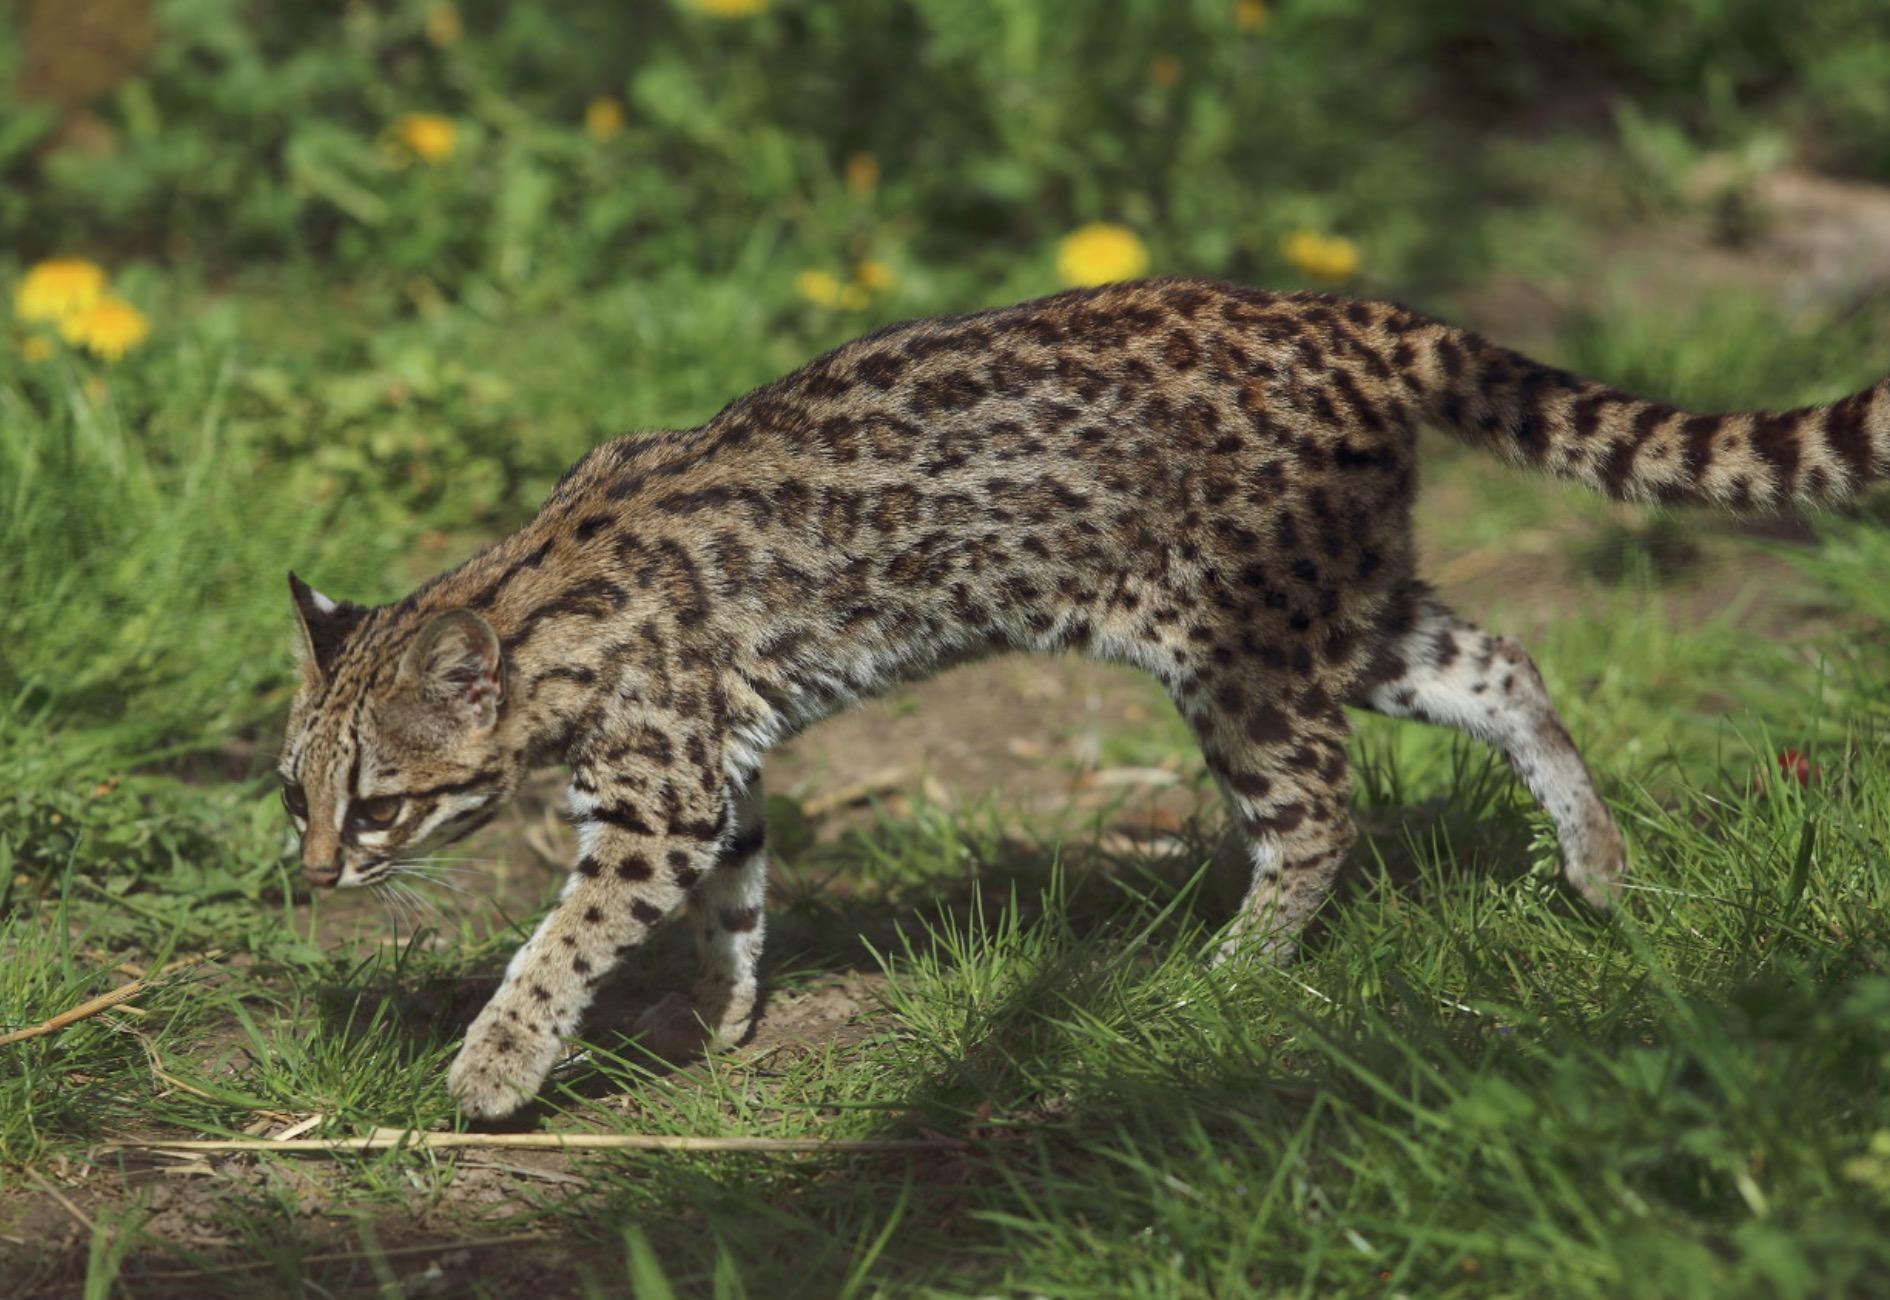 18-Leopardus tigrinus.JPEG